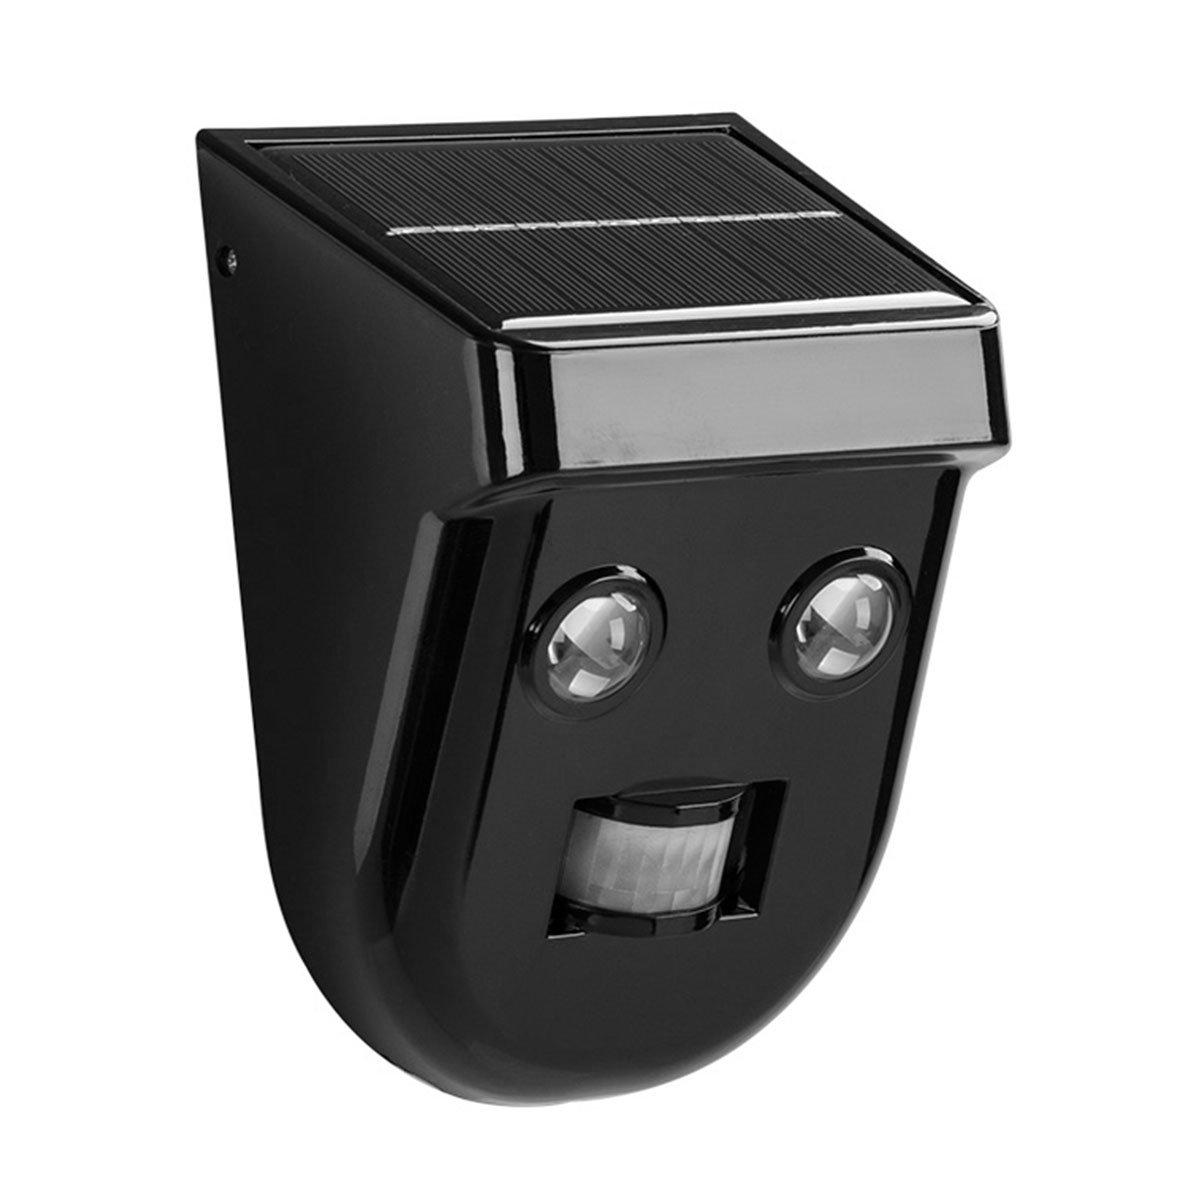 Lightsetc Smd Led Solar Sensor Motion Light Ip65 Waterproof Outdoor Security .. 14